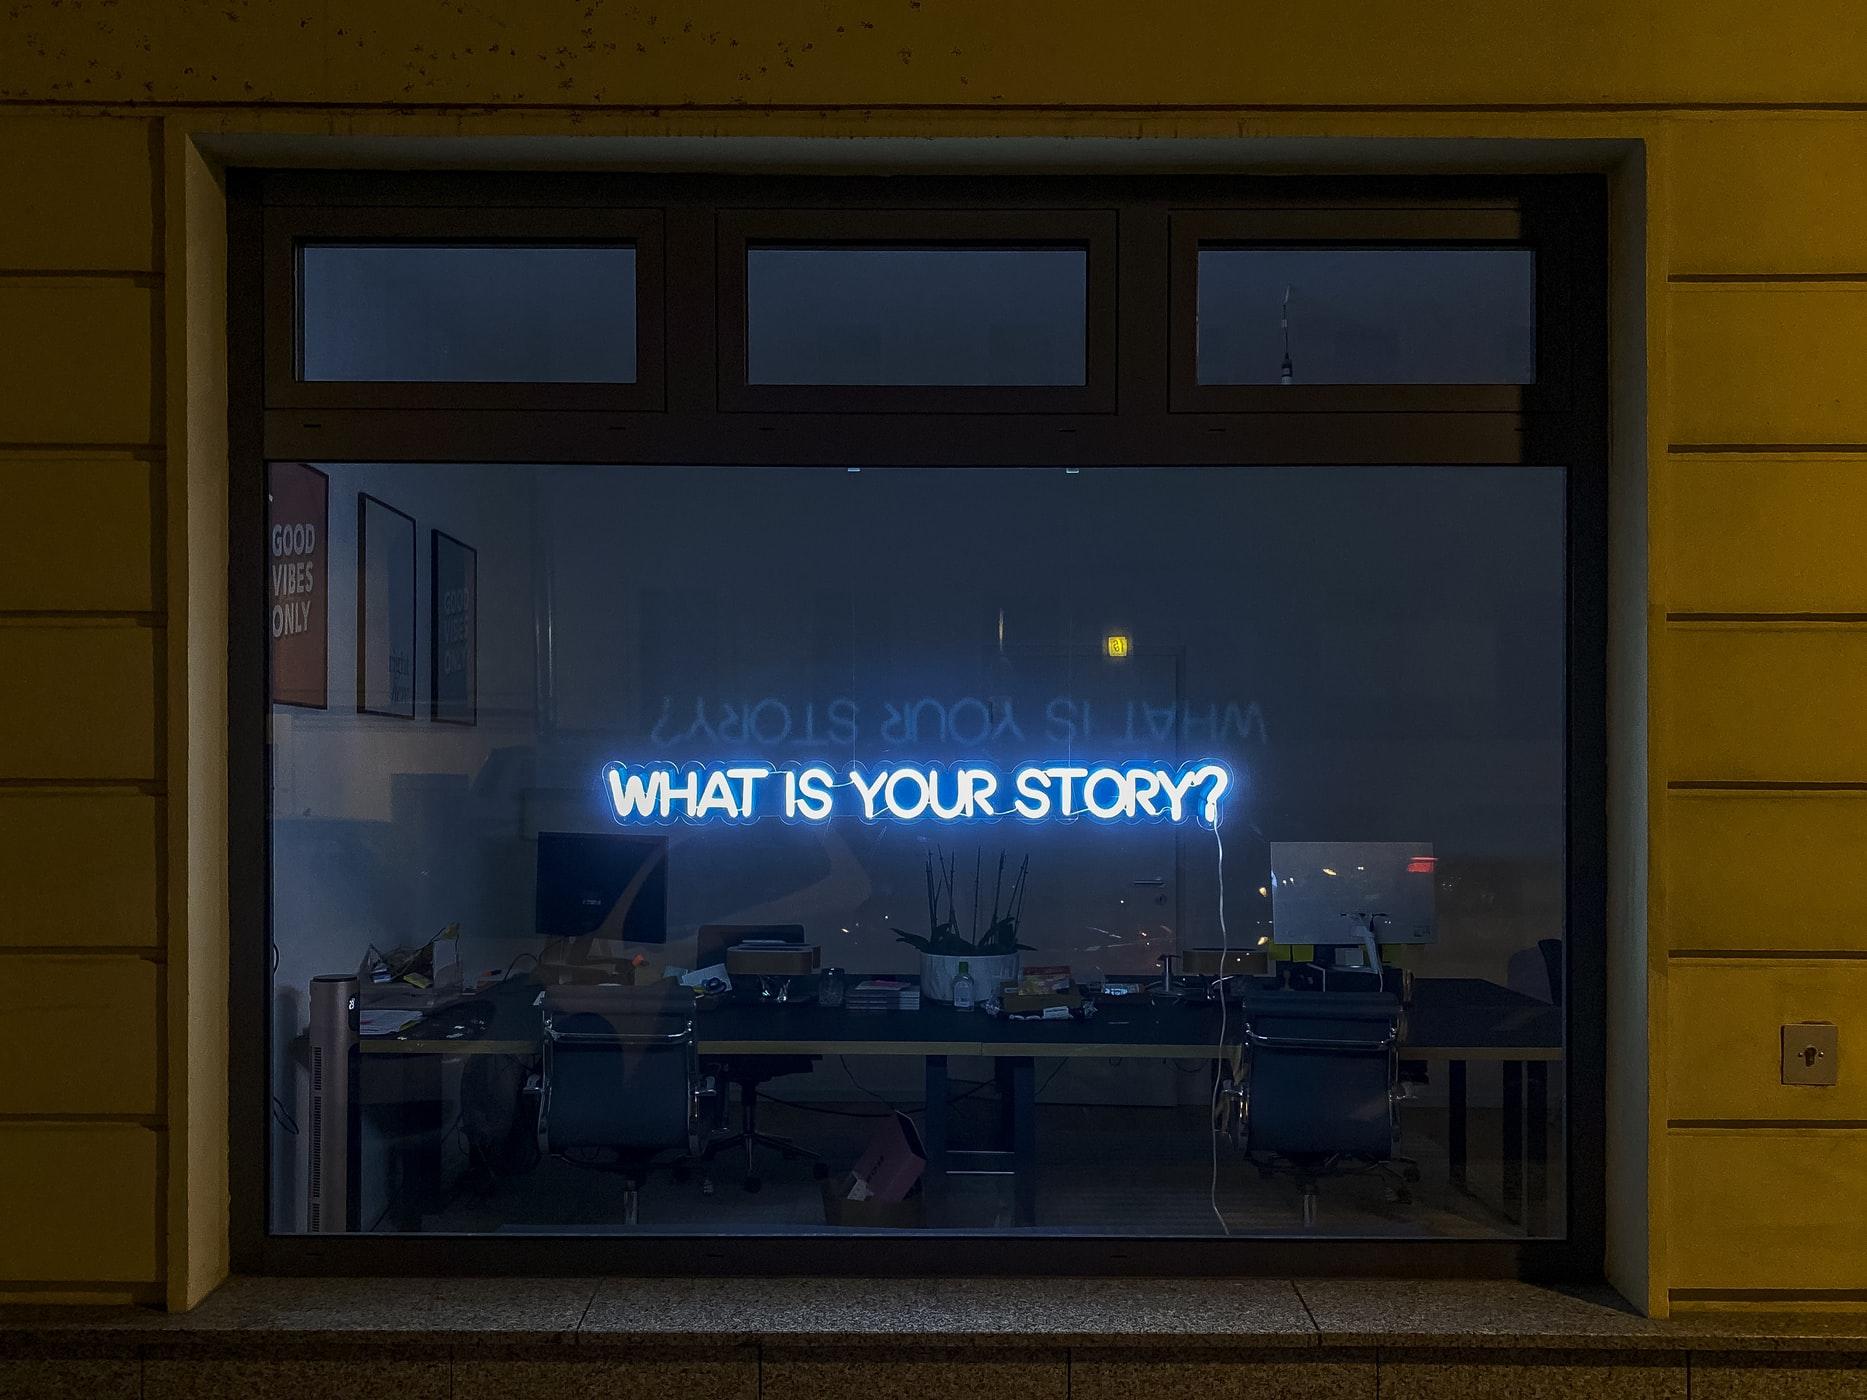 créer votre storytelling